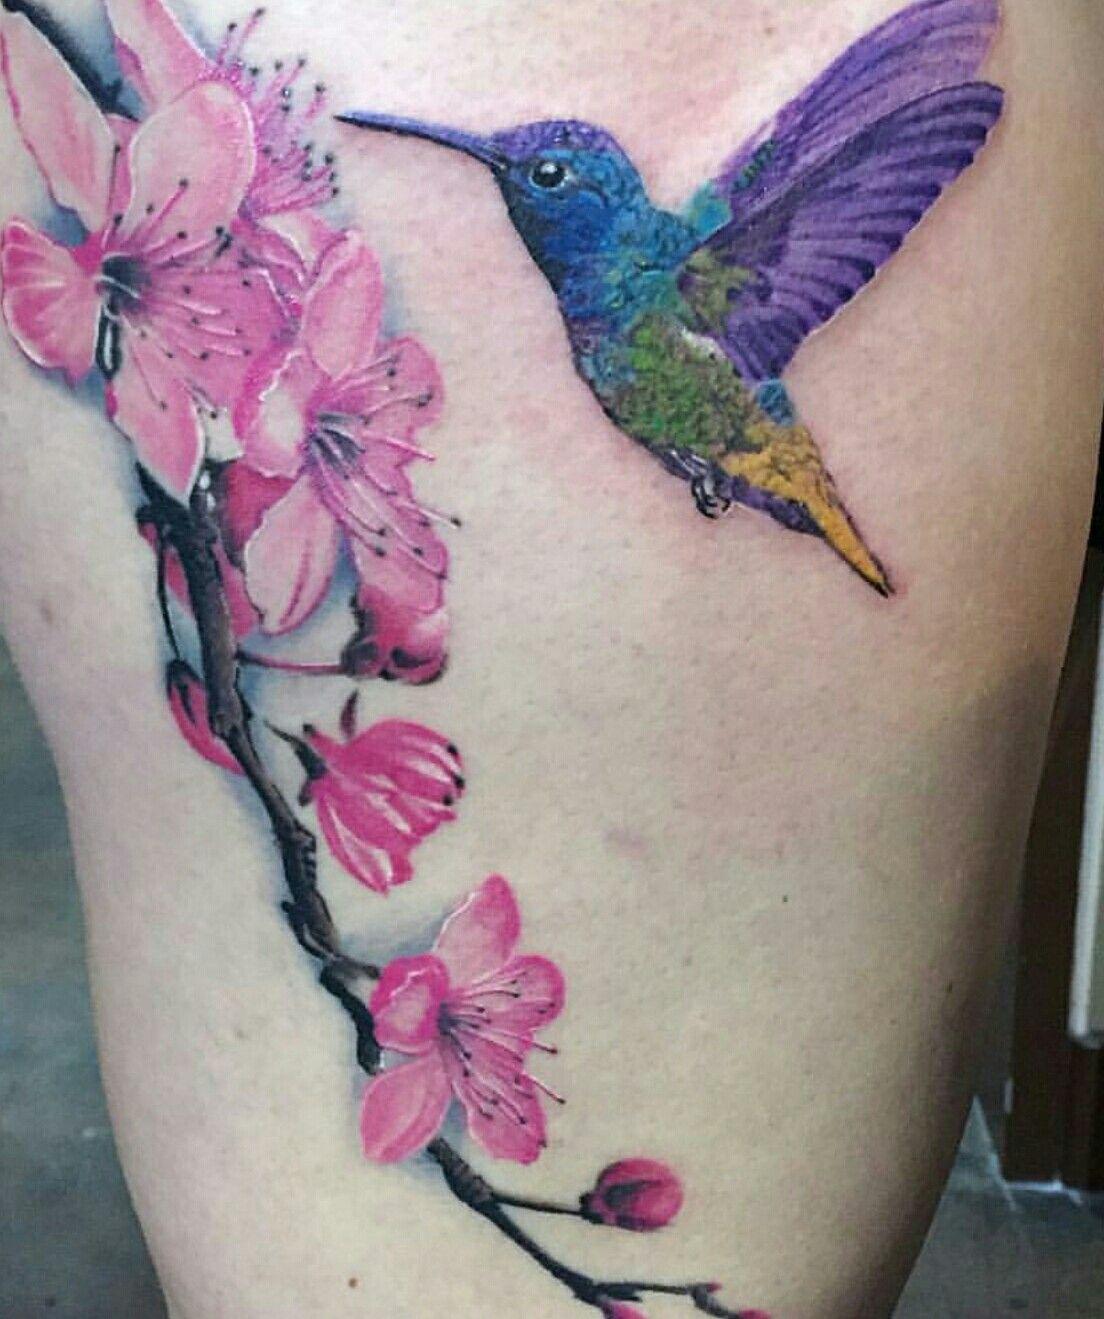 Hummingbird Flower Tattoos: Hummingbird Flower Tattoos, Tattoos